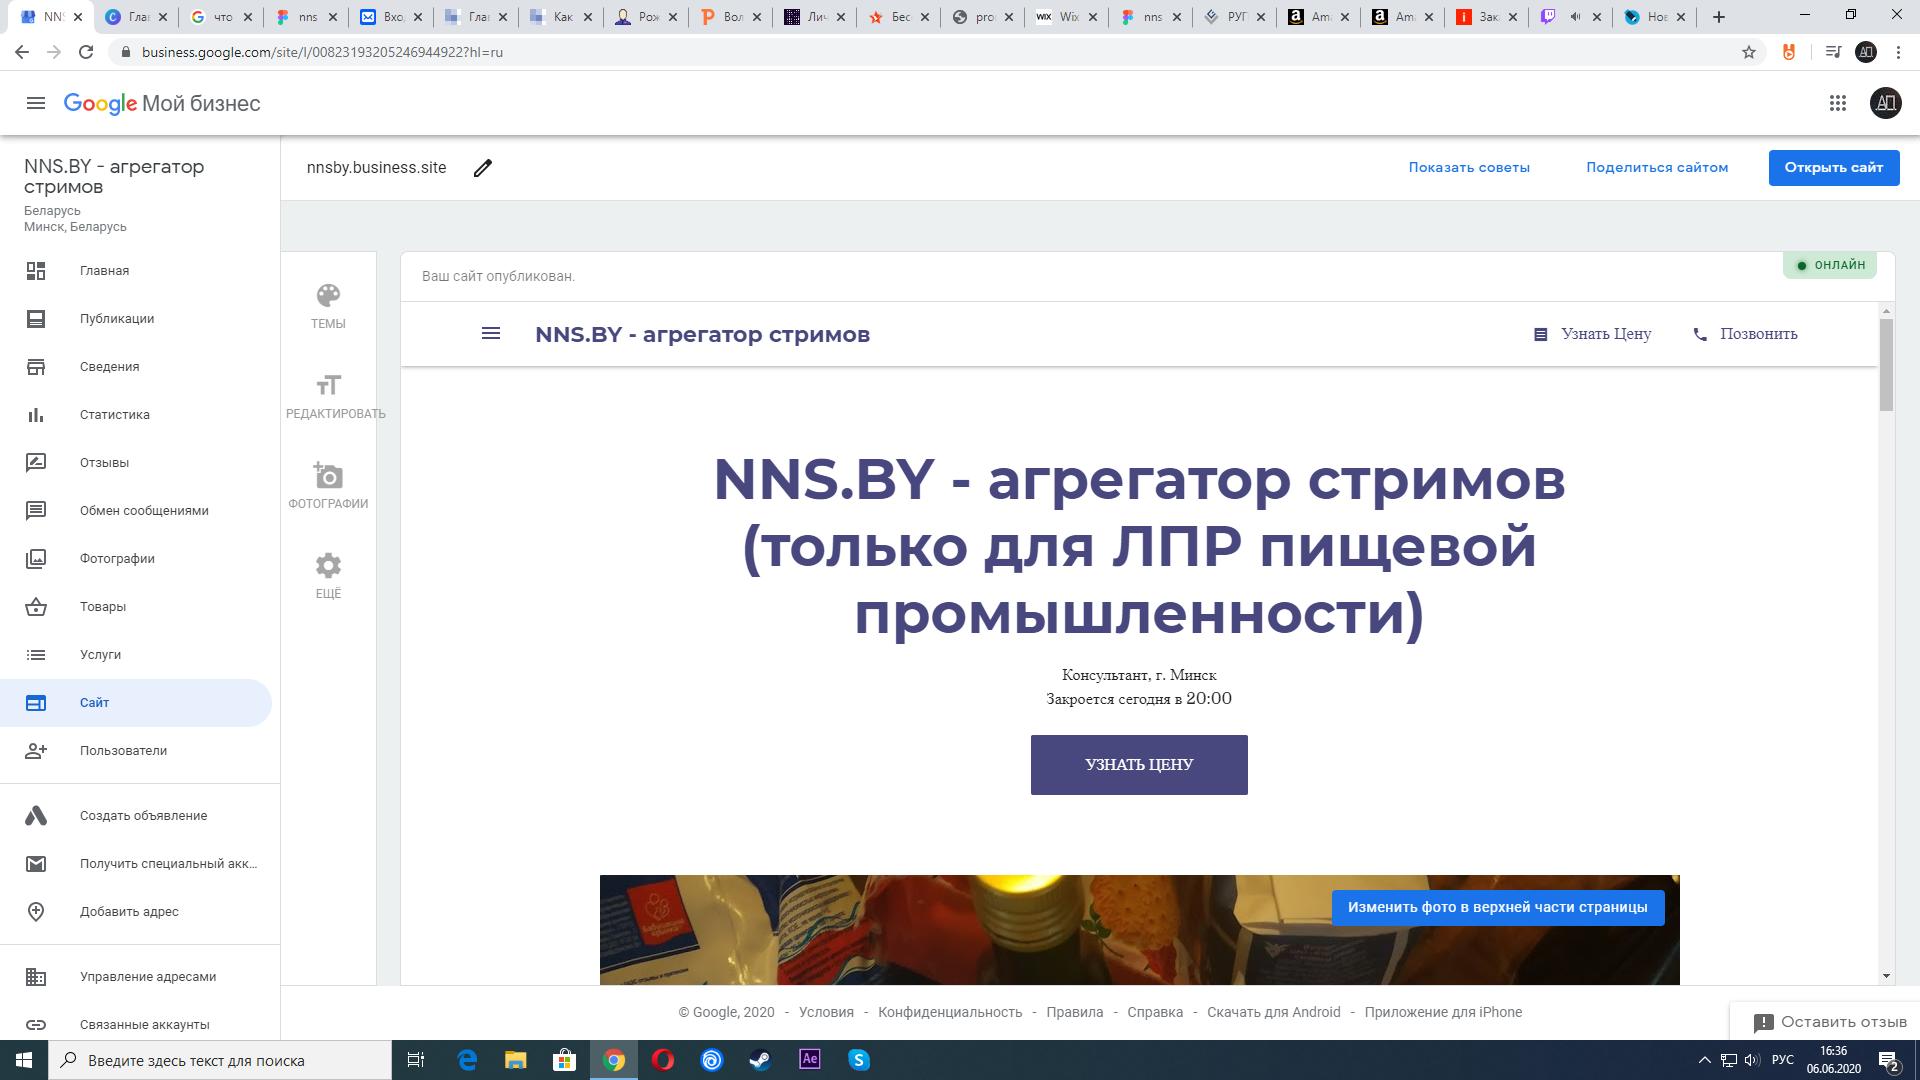 Сайт в гугл мой бизнес